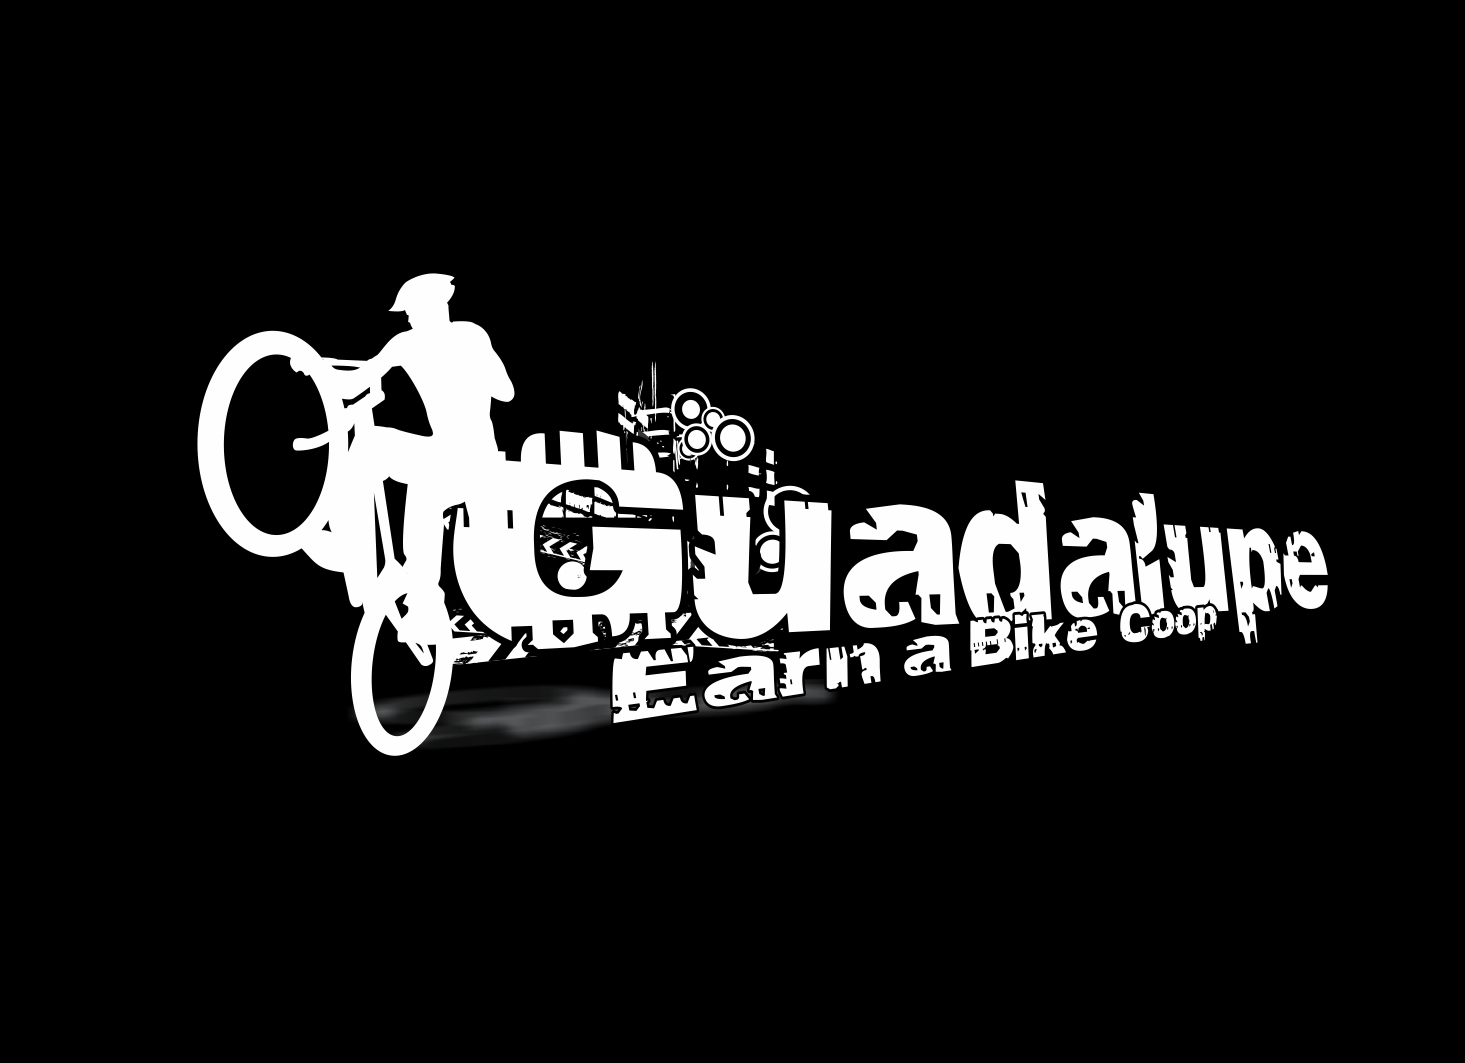 Logo Design by Zdravko Krulj - Entry No. 43 in the Logo Design Contest Inspiring Logo Design for Guadalupe Earn a Bike Coop..